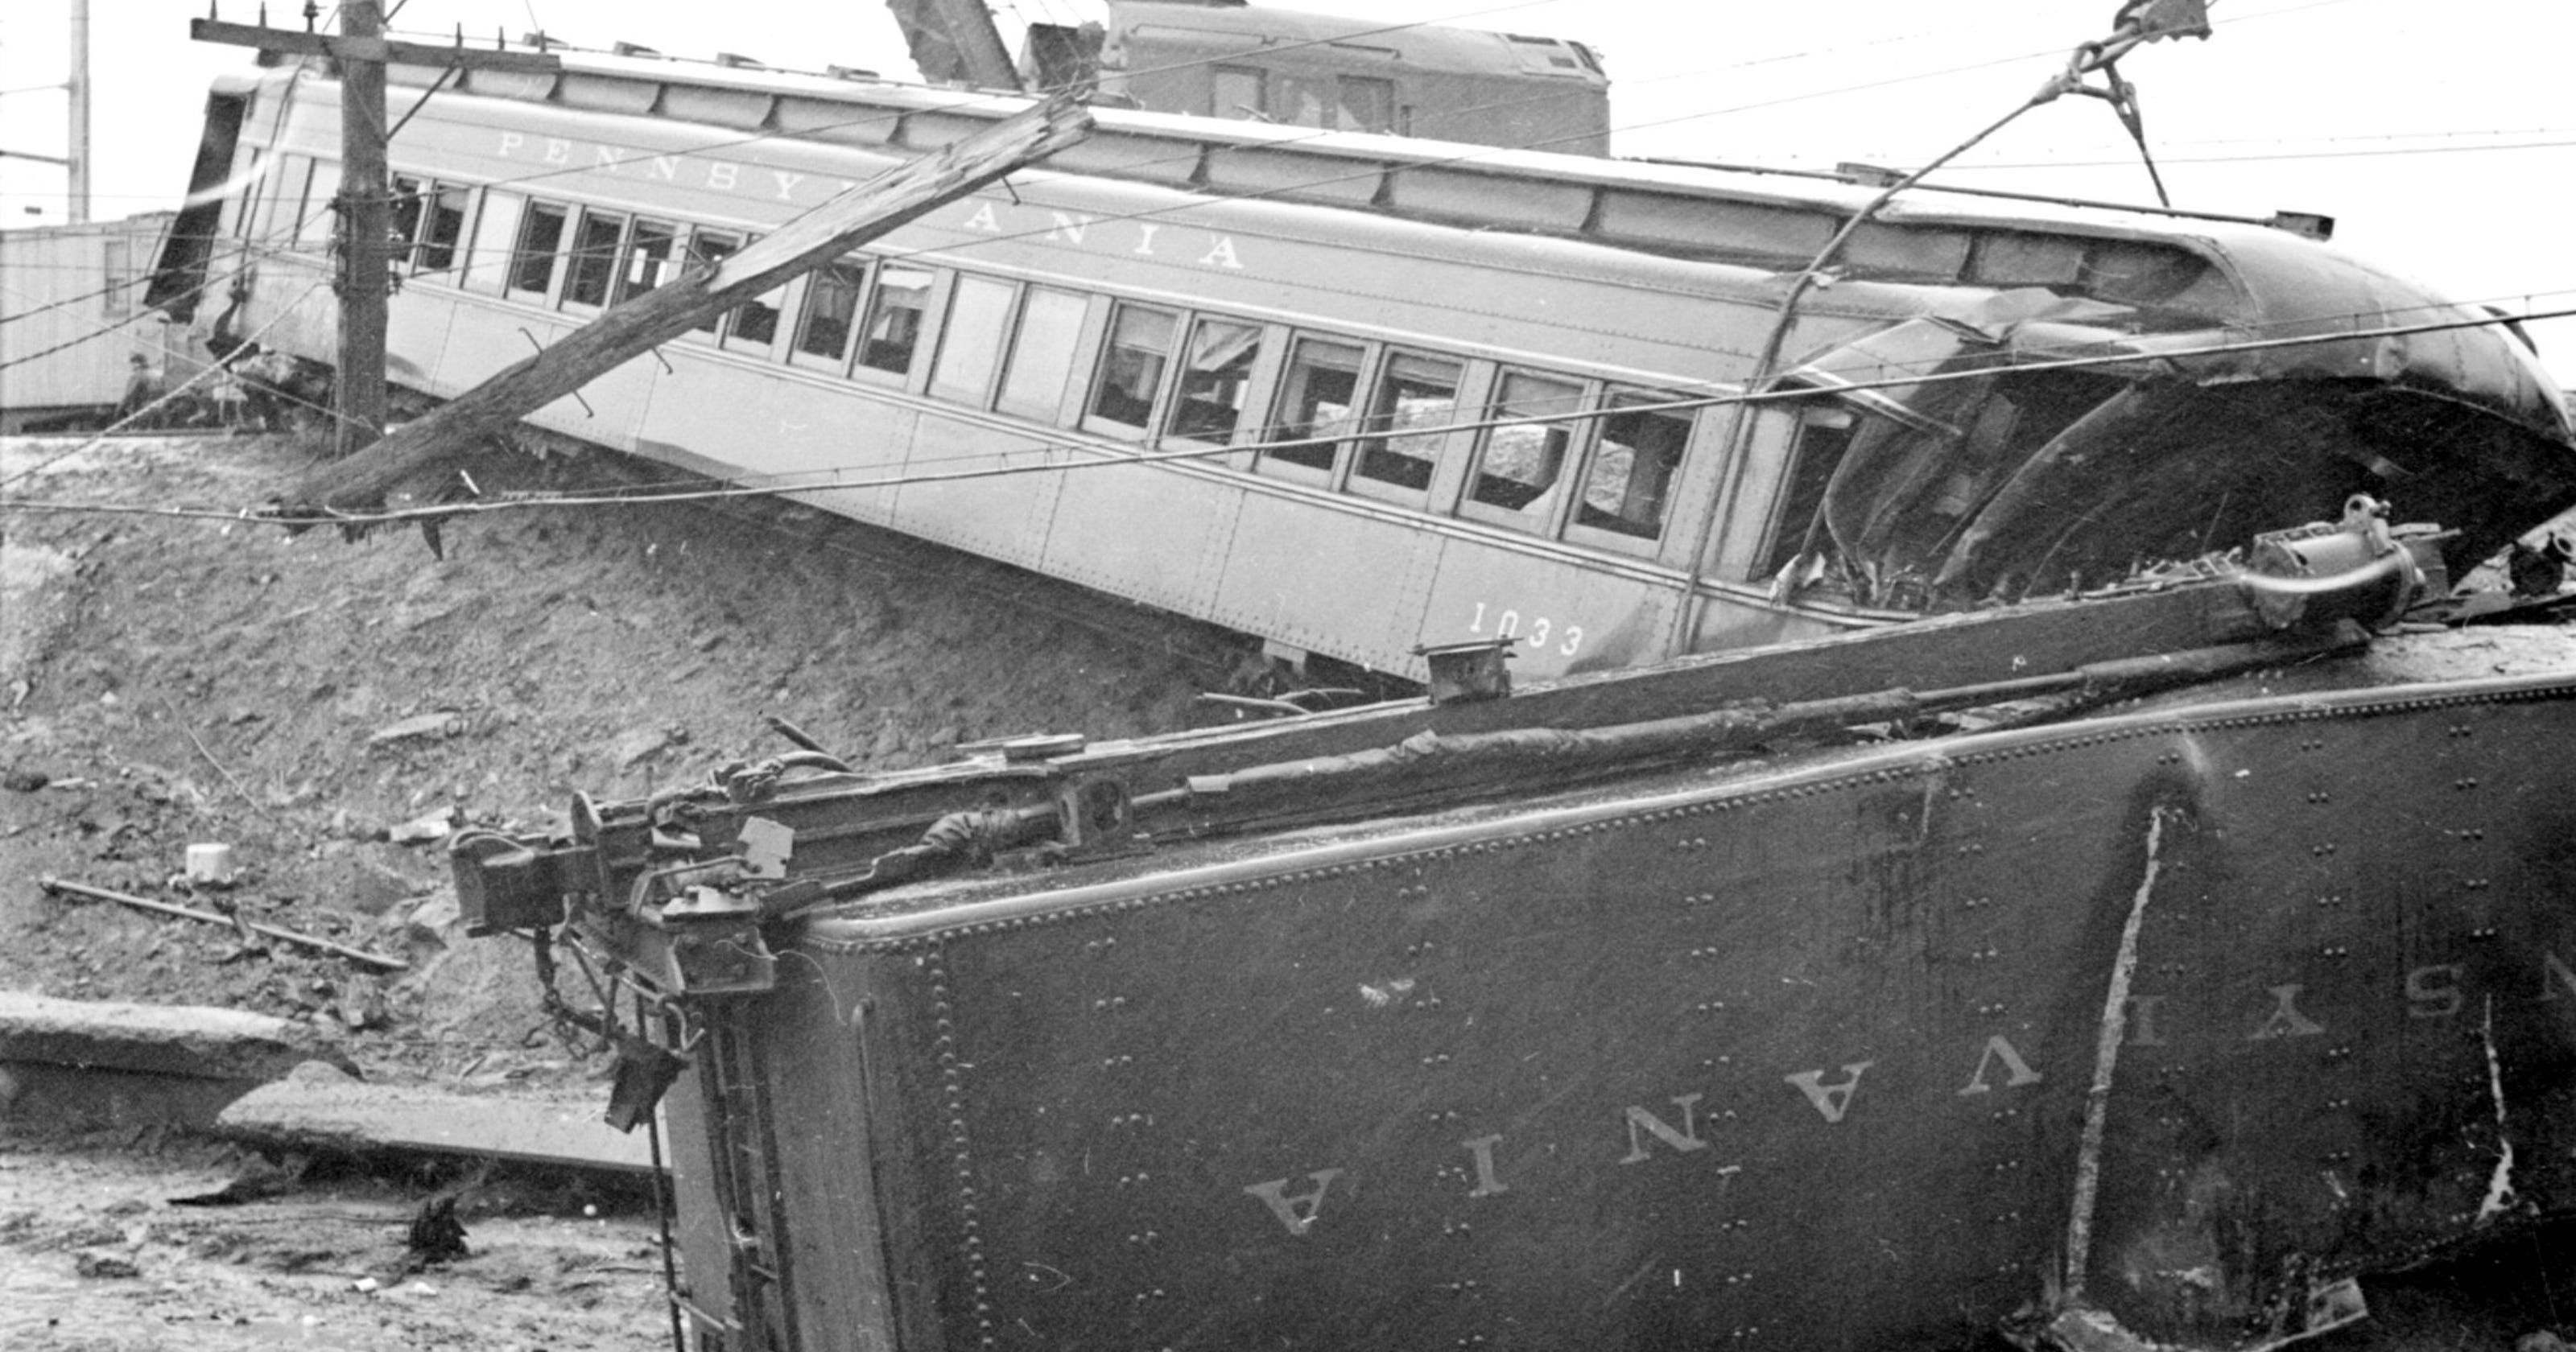 Resident recalls deadly Woodbridge train wreck of 1951